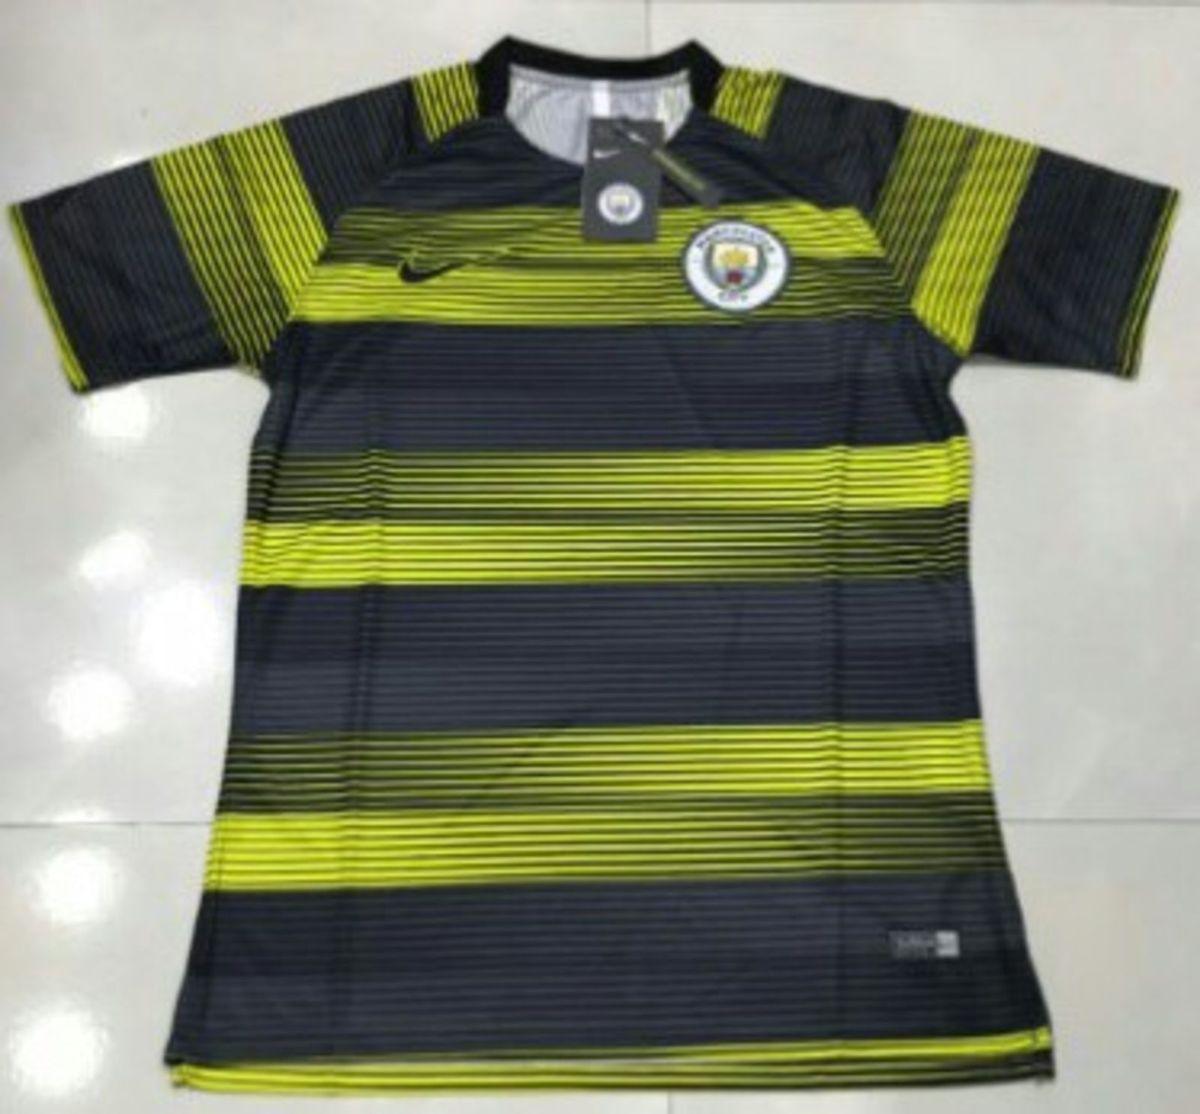 camisa do manchester city treino importada pronta entrega - esportes nike 793dd08fcf674